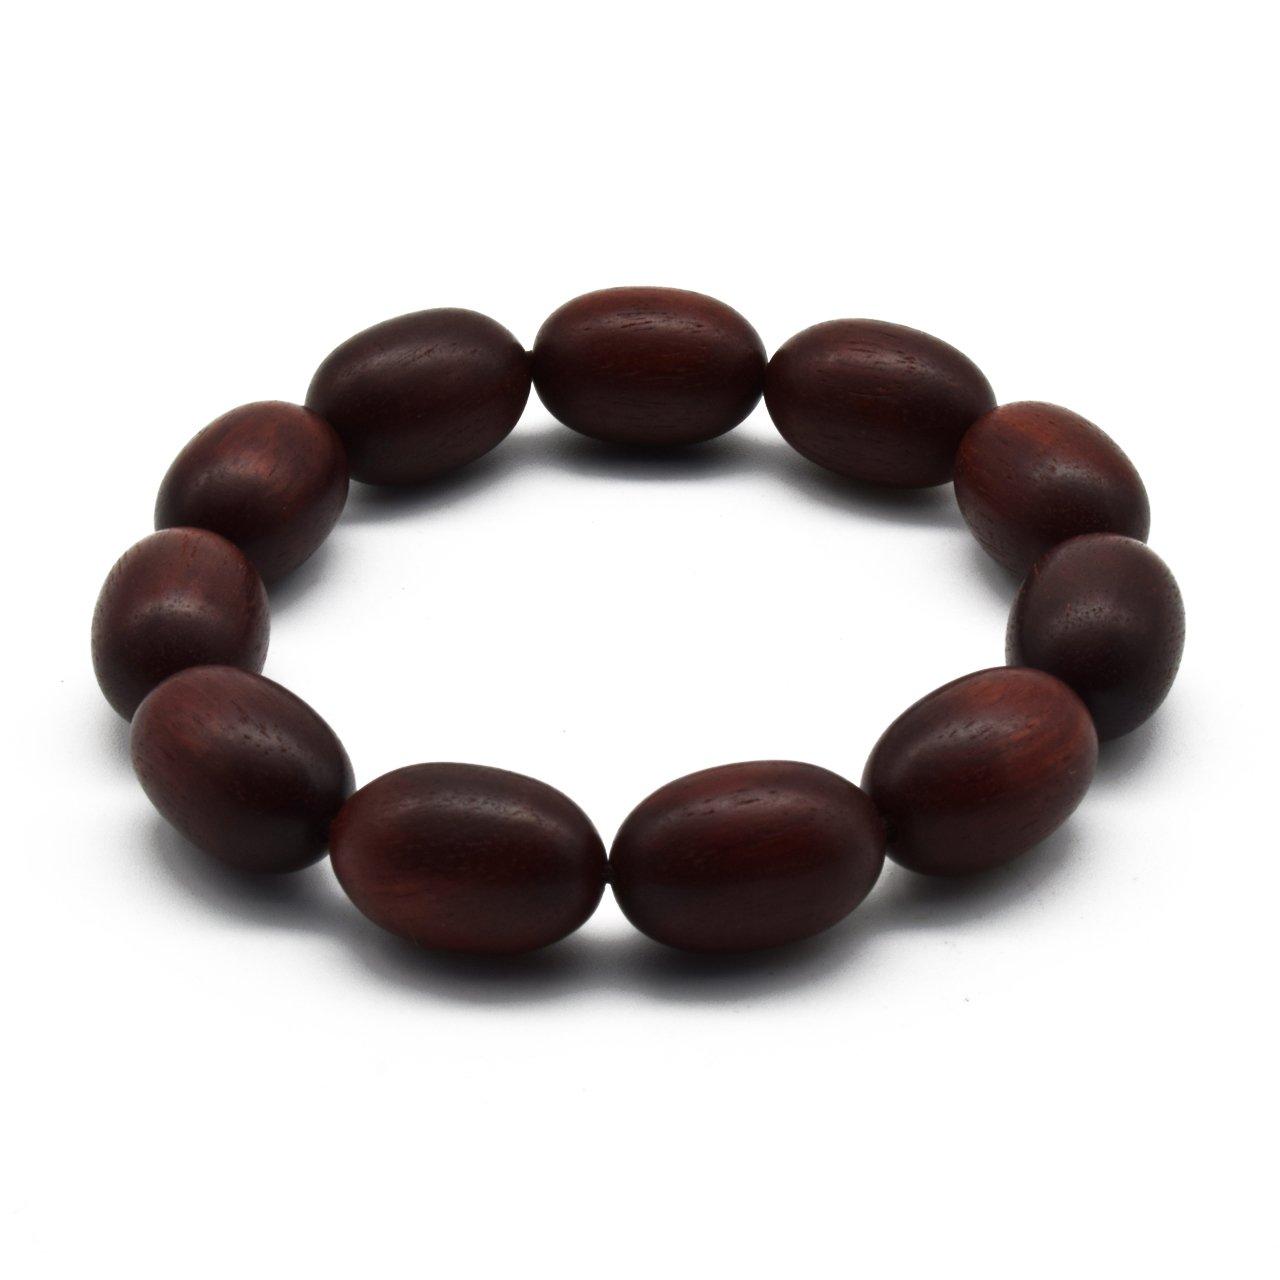 Zen Dear Unisex Natural African Blood Red Sandalwood Prayer Beads Tibetan Buddhism Mala Bracelet Necklace (12mm x 18mm Olives x 11 Beads)